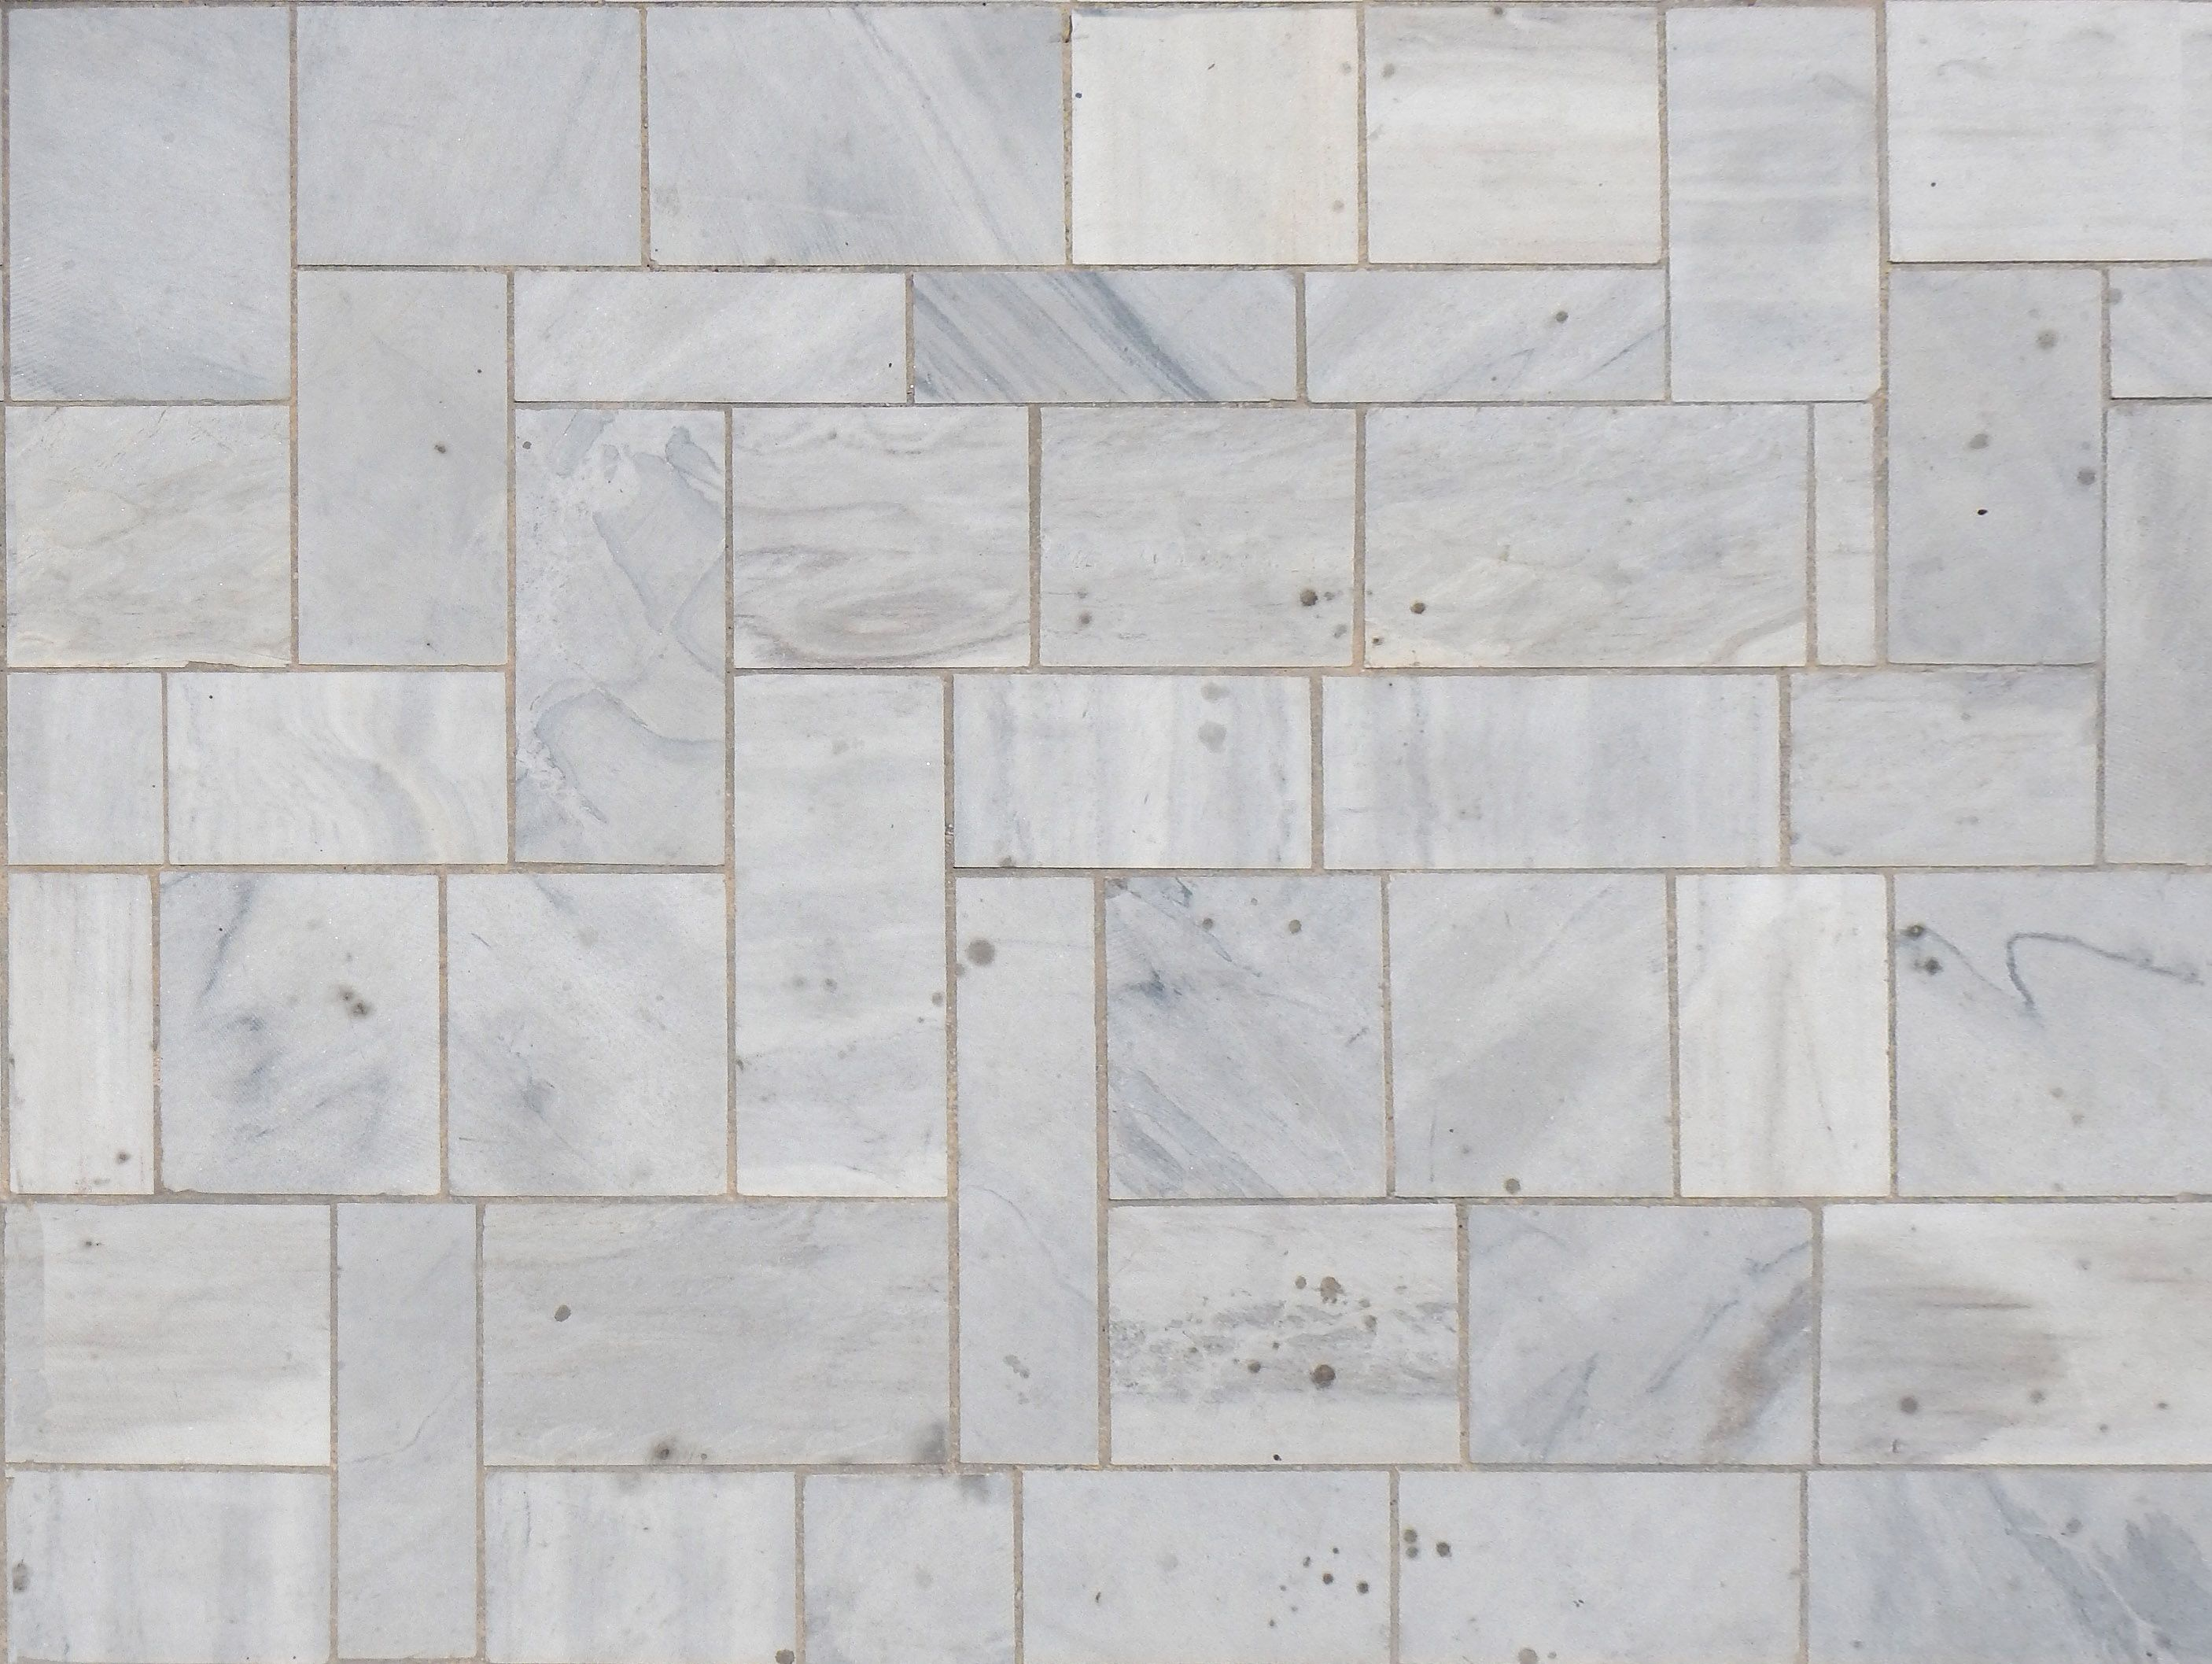 32 Attractive Tiles Textured Decortez Wood Tile Bathroom Flooring Stone Flooring